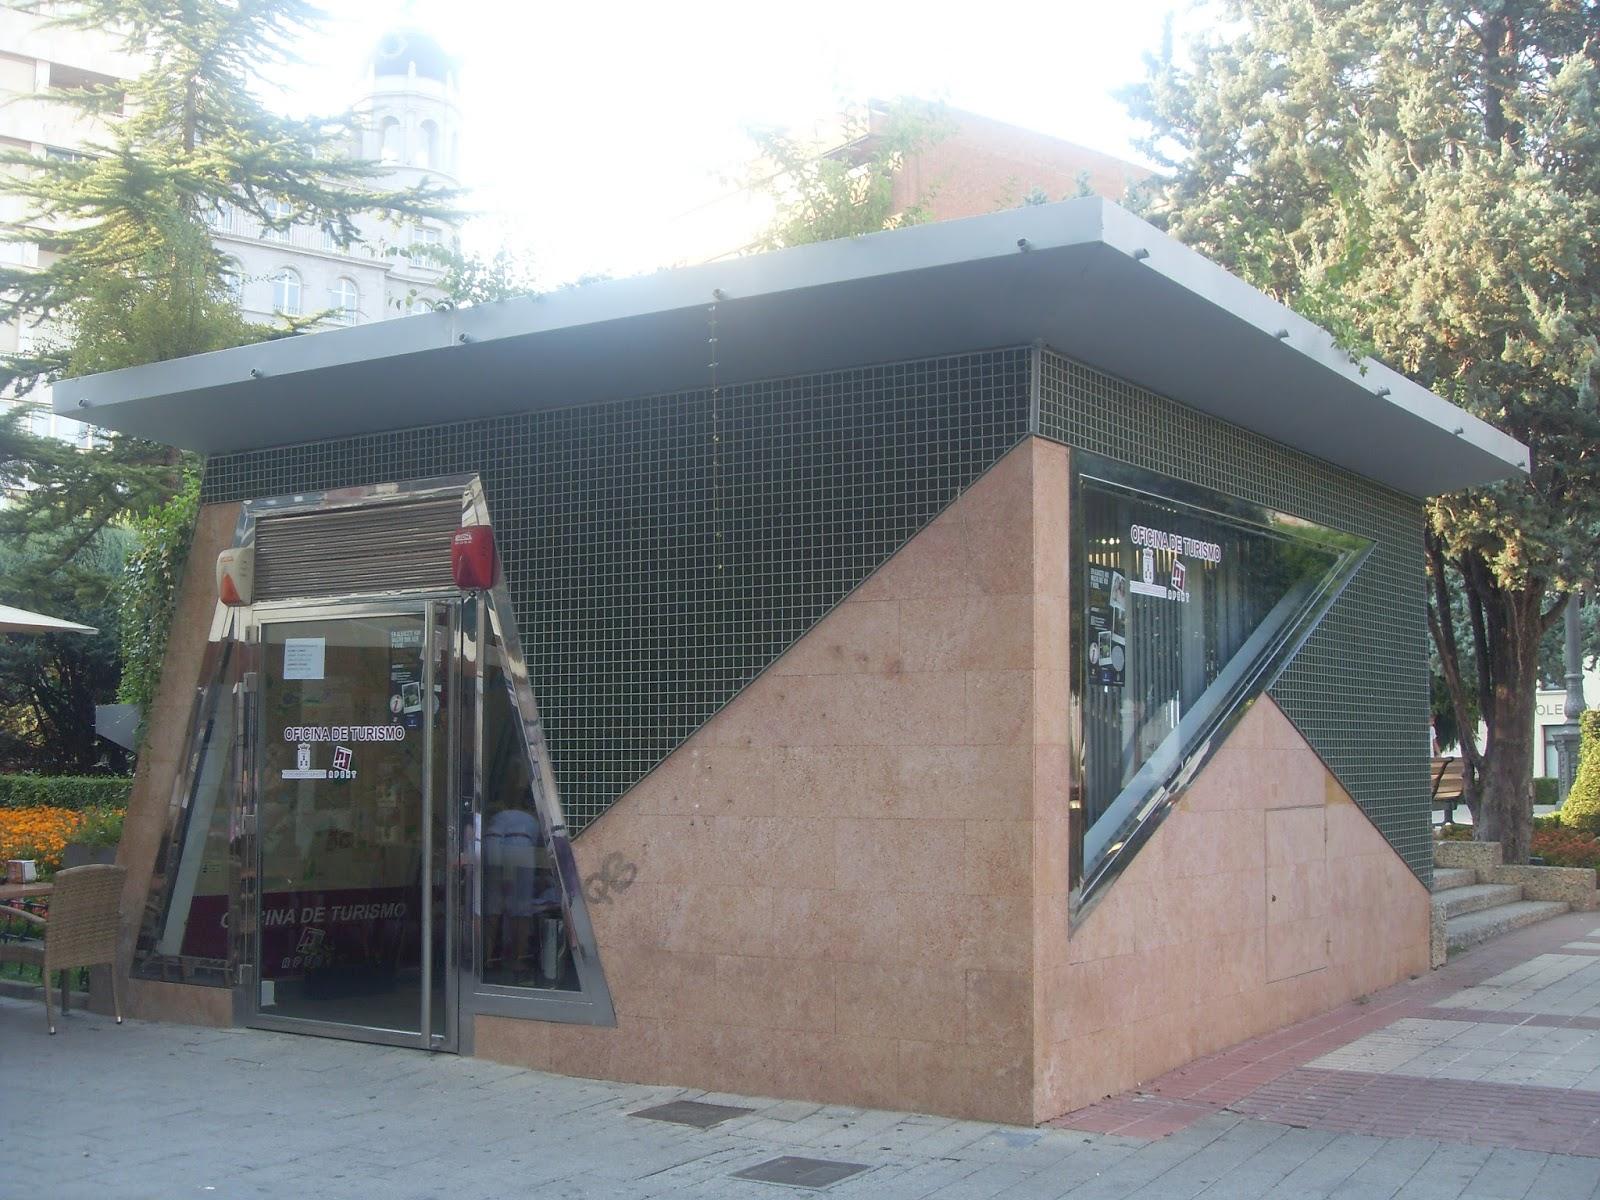 Albacete bienmesabe la oferta gastron mica de albacete en for Oficina de turismo albacete